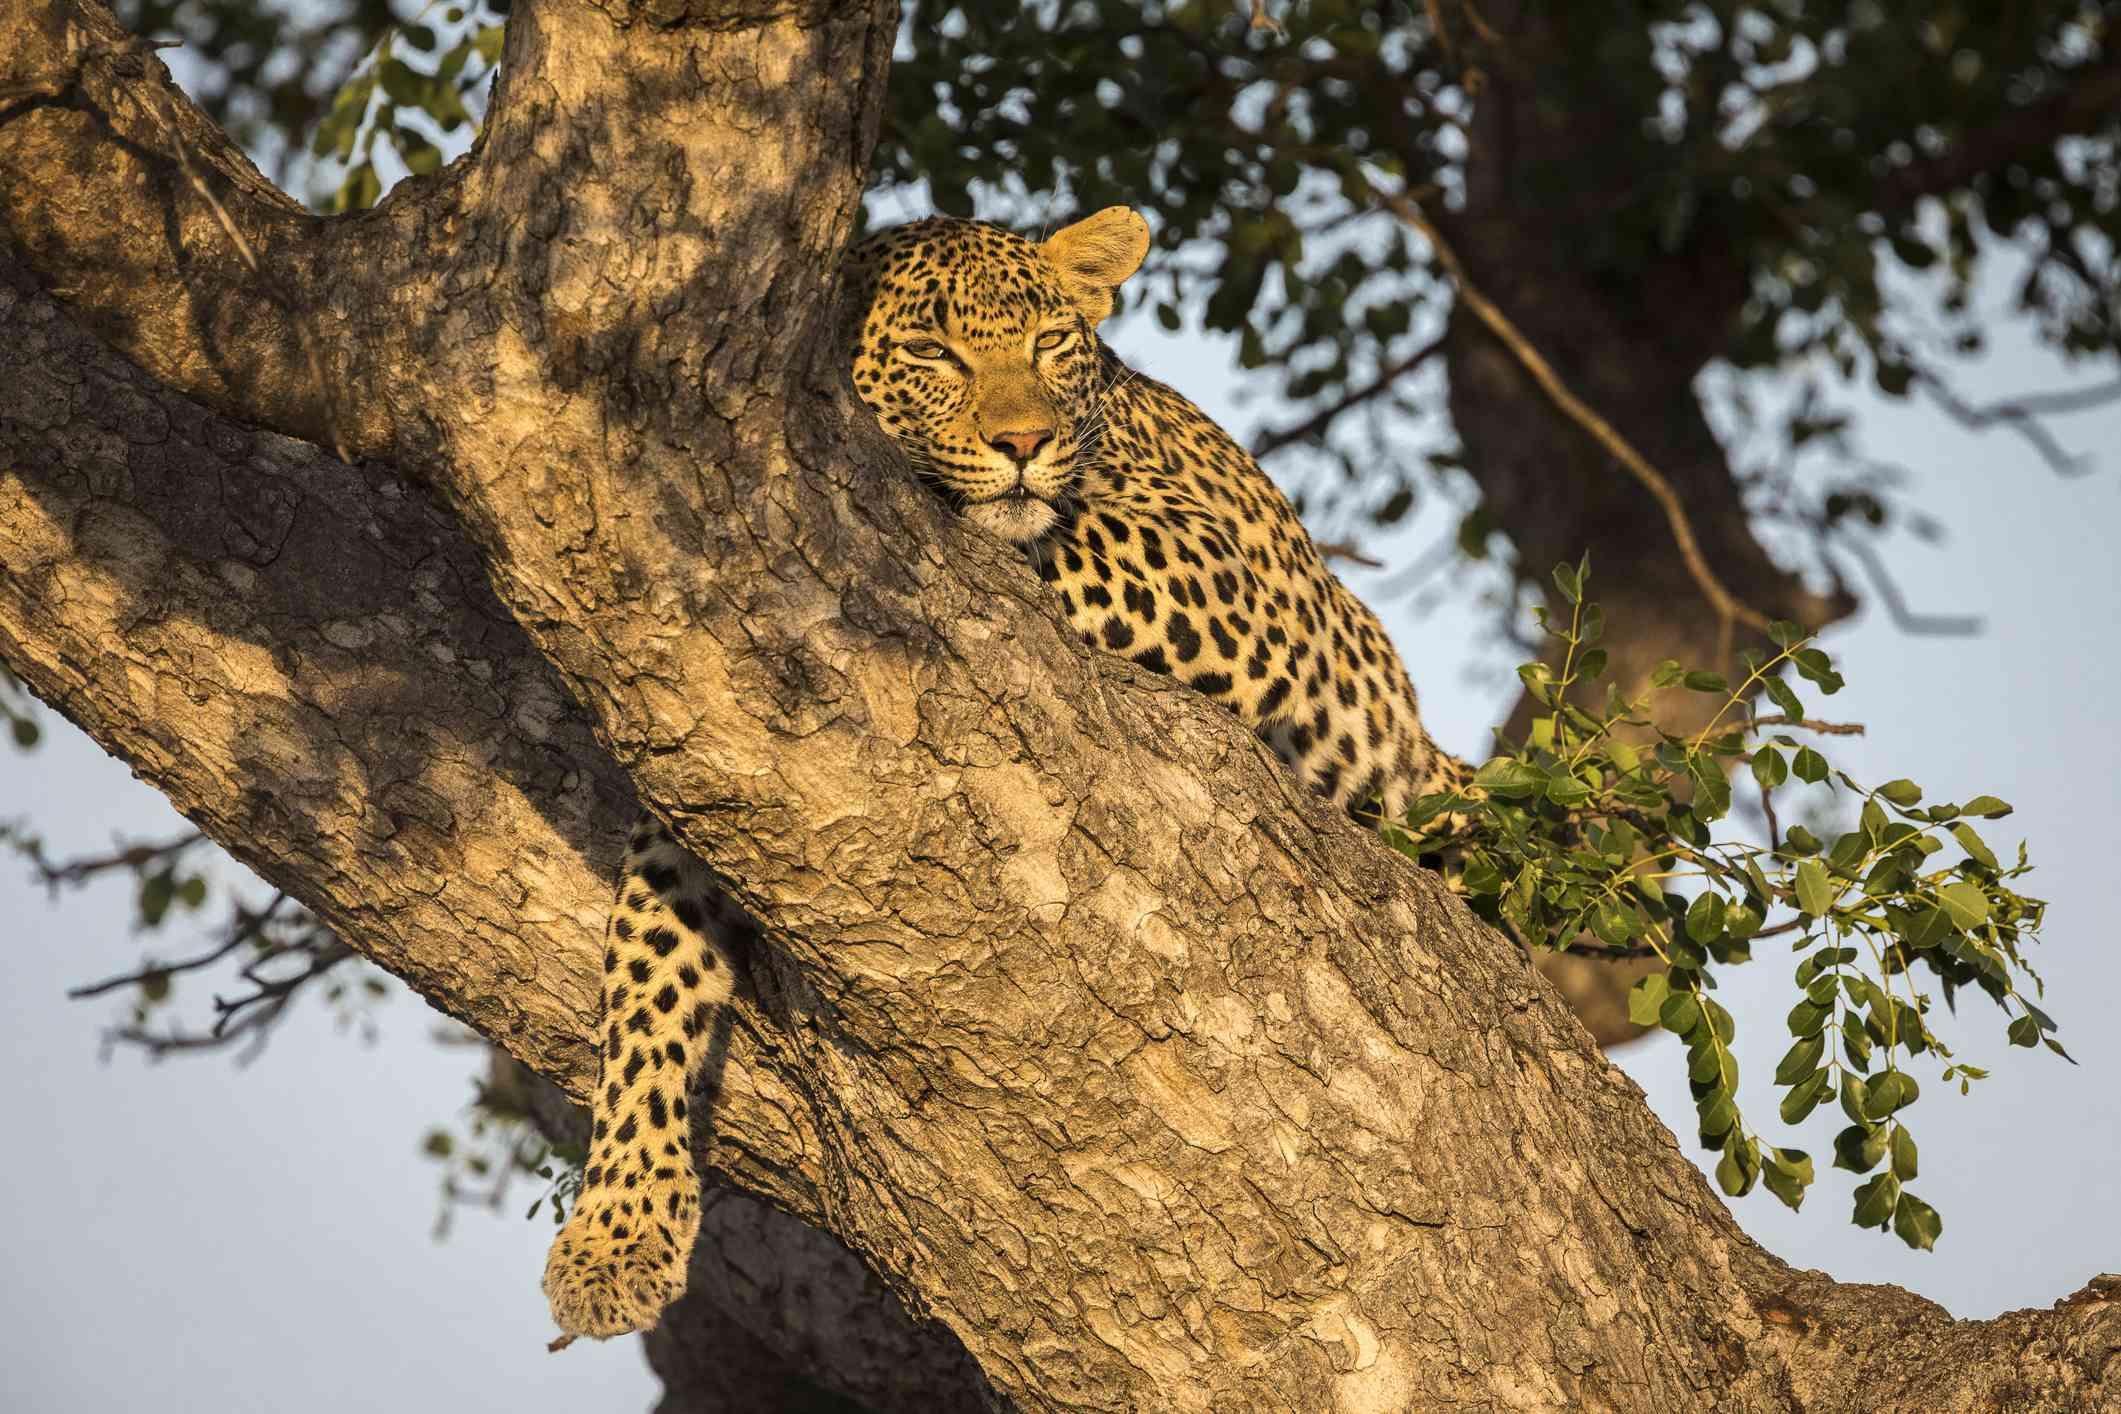 Female leopard resting in a tree, Sabi Sands Game Reserve